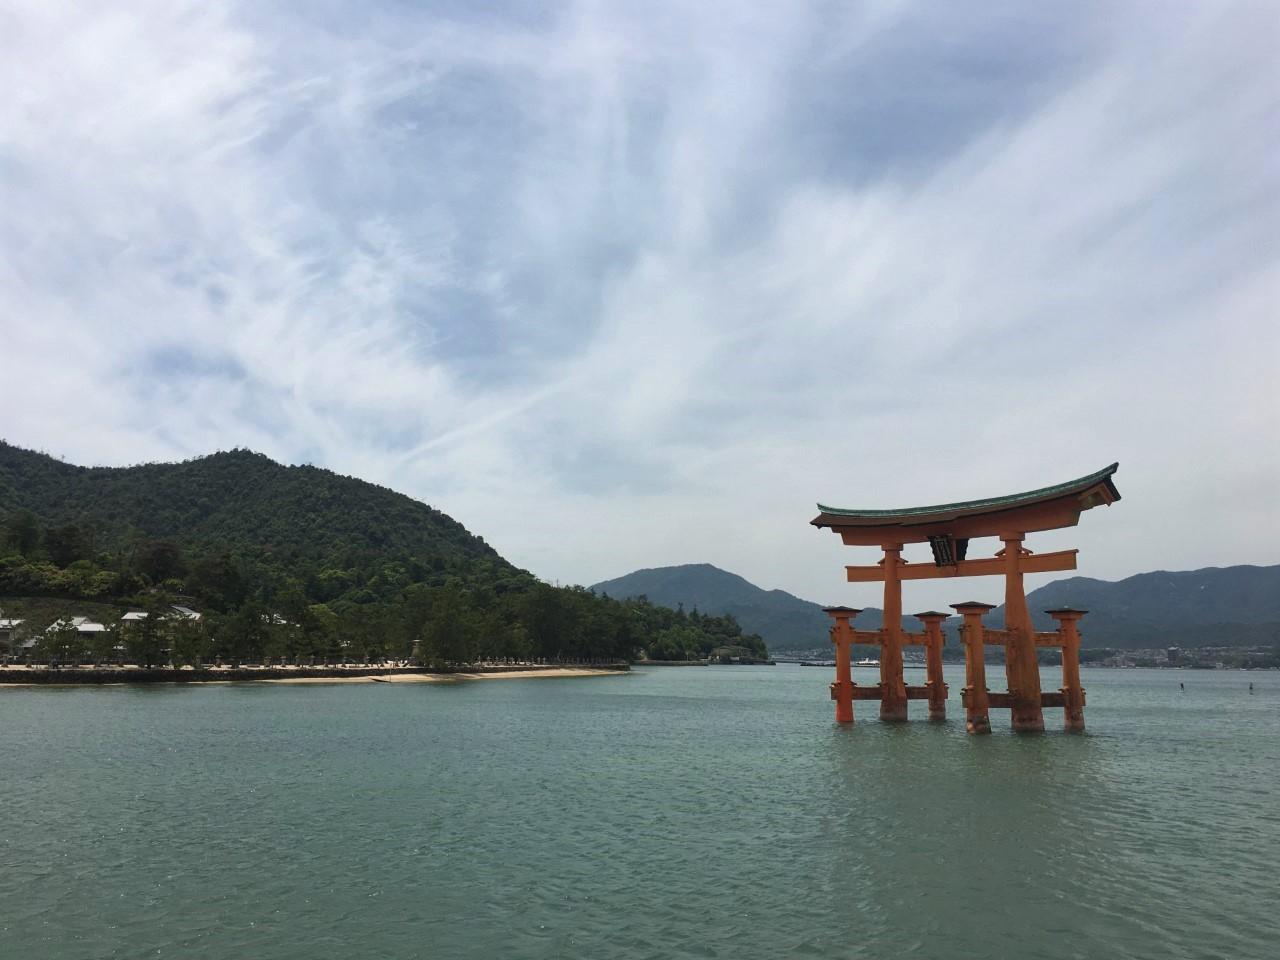 Floating Torii gate miyajima island